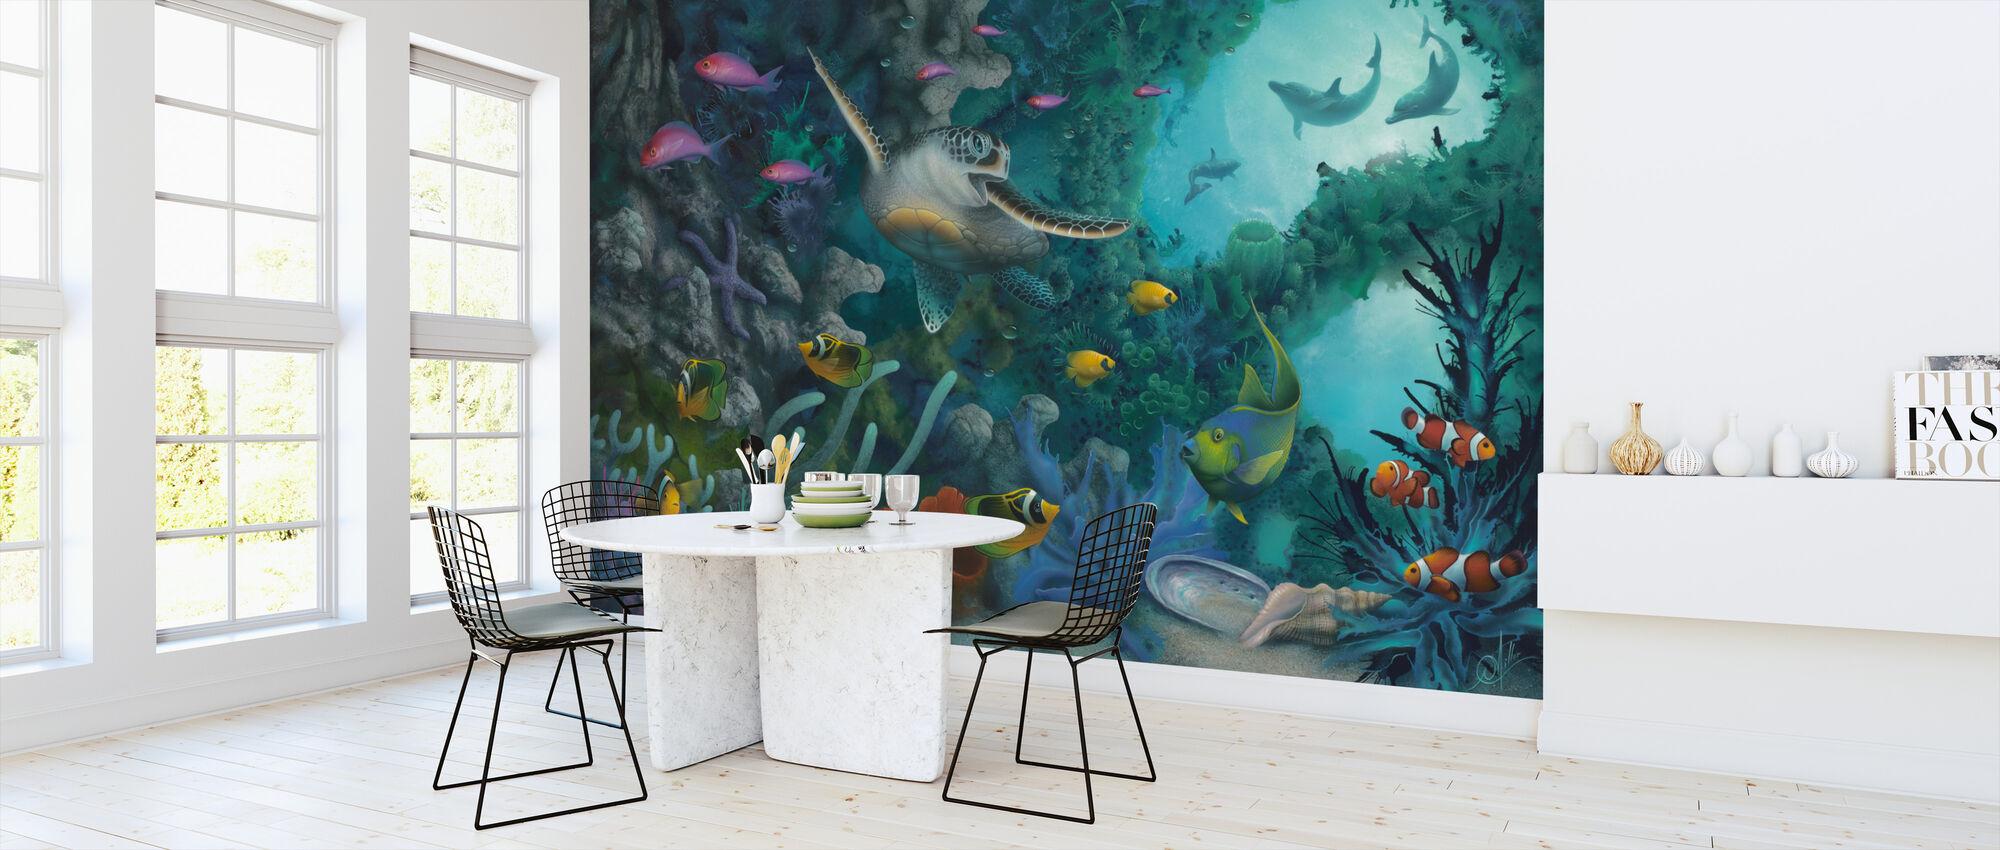 Jewels of the Sea - Wallpaper - Kitchen